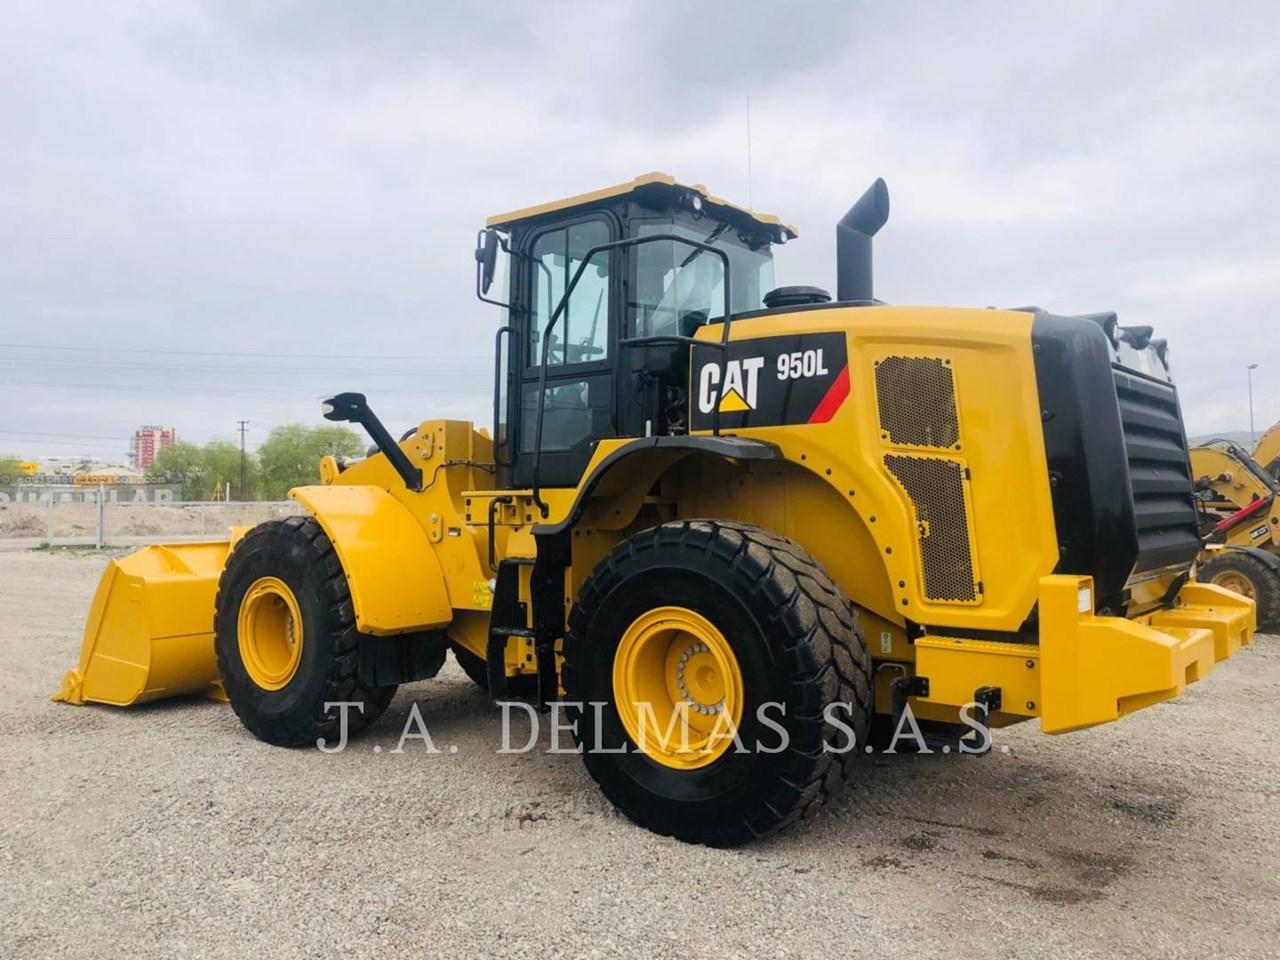 2018 Caterpillar 950L Image 1